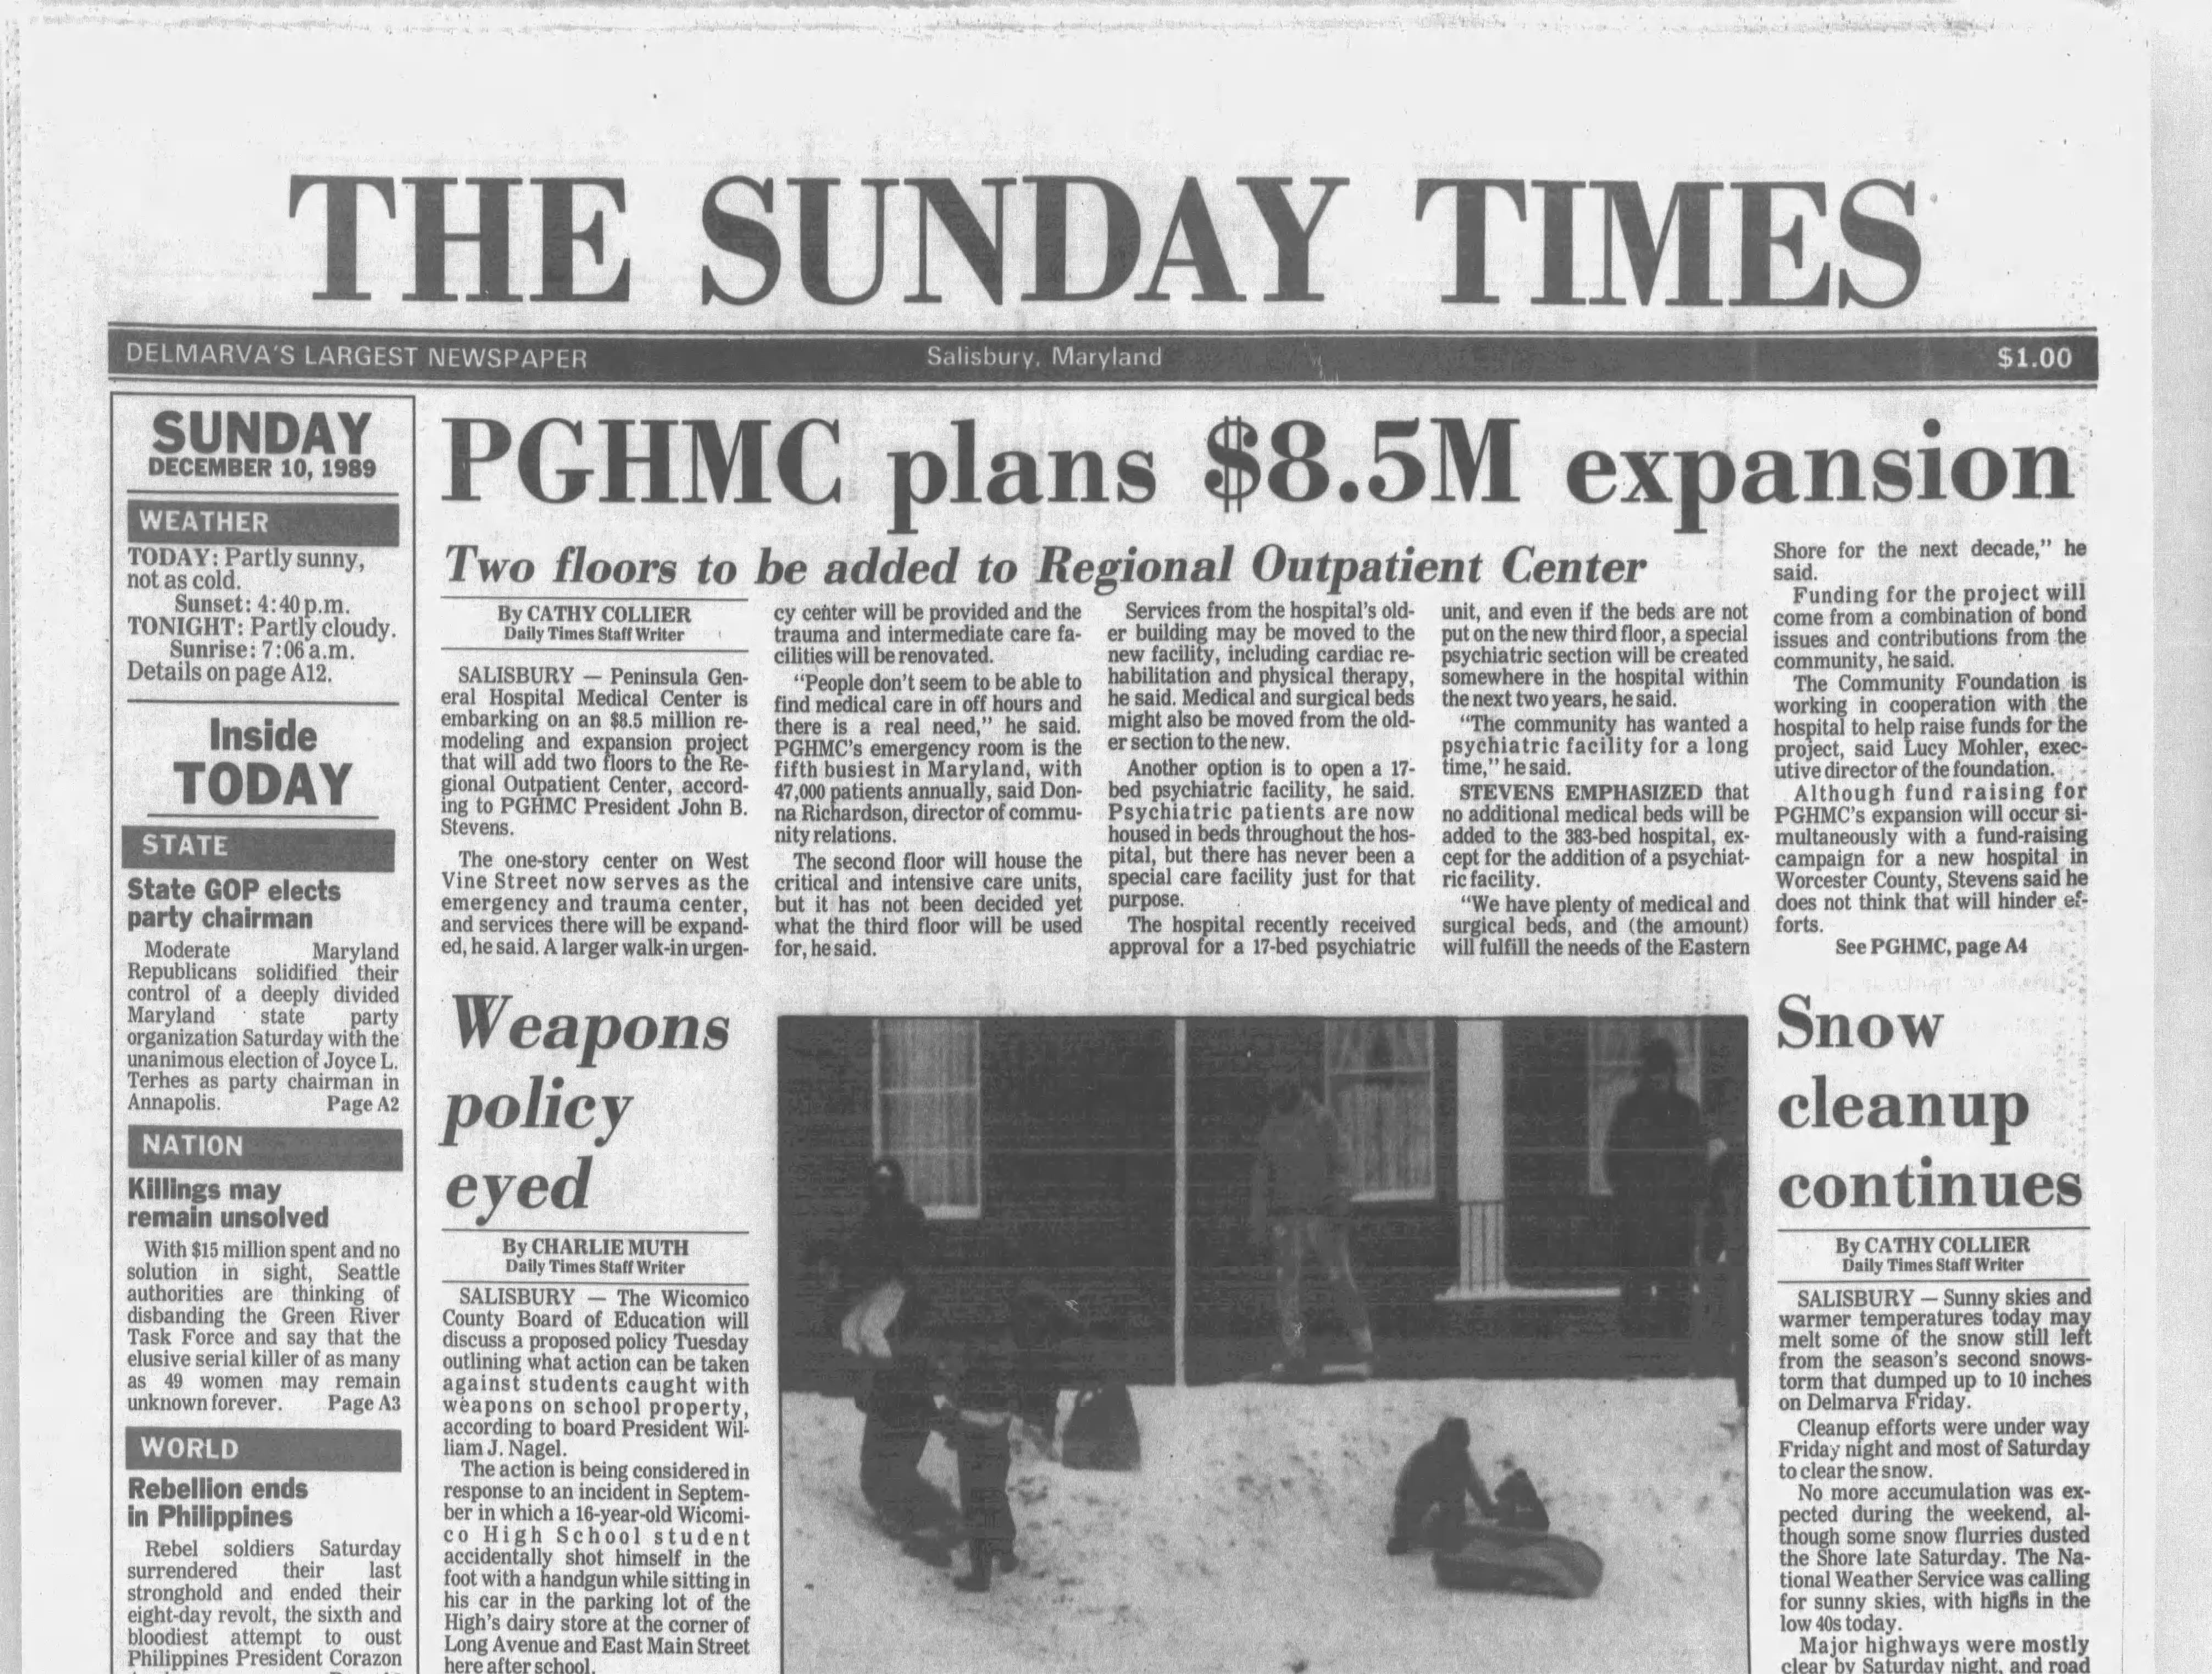 "On Dec 10, 1989, Salisbury received 10"" of snow."